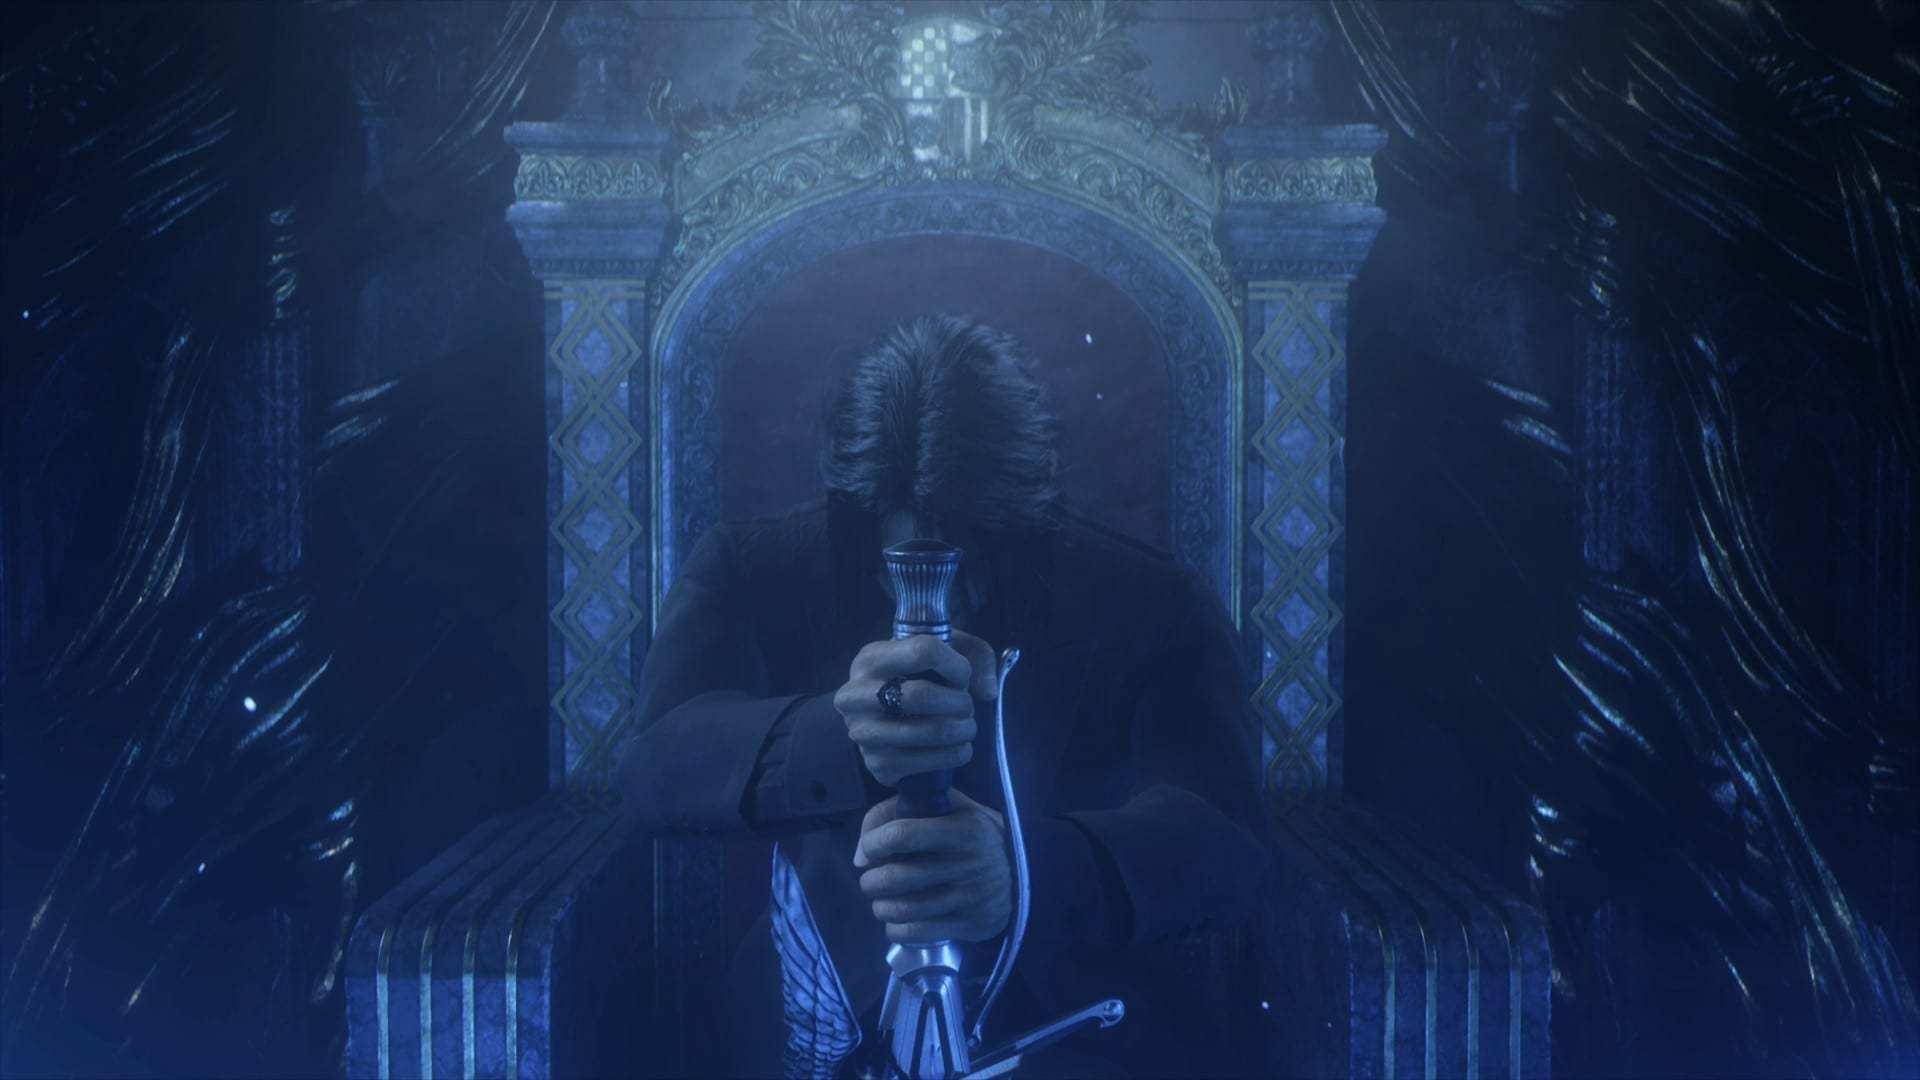 Ffxv Wallpaper 4k Final Fantasy Noctis 4k 355079 Hd